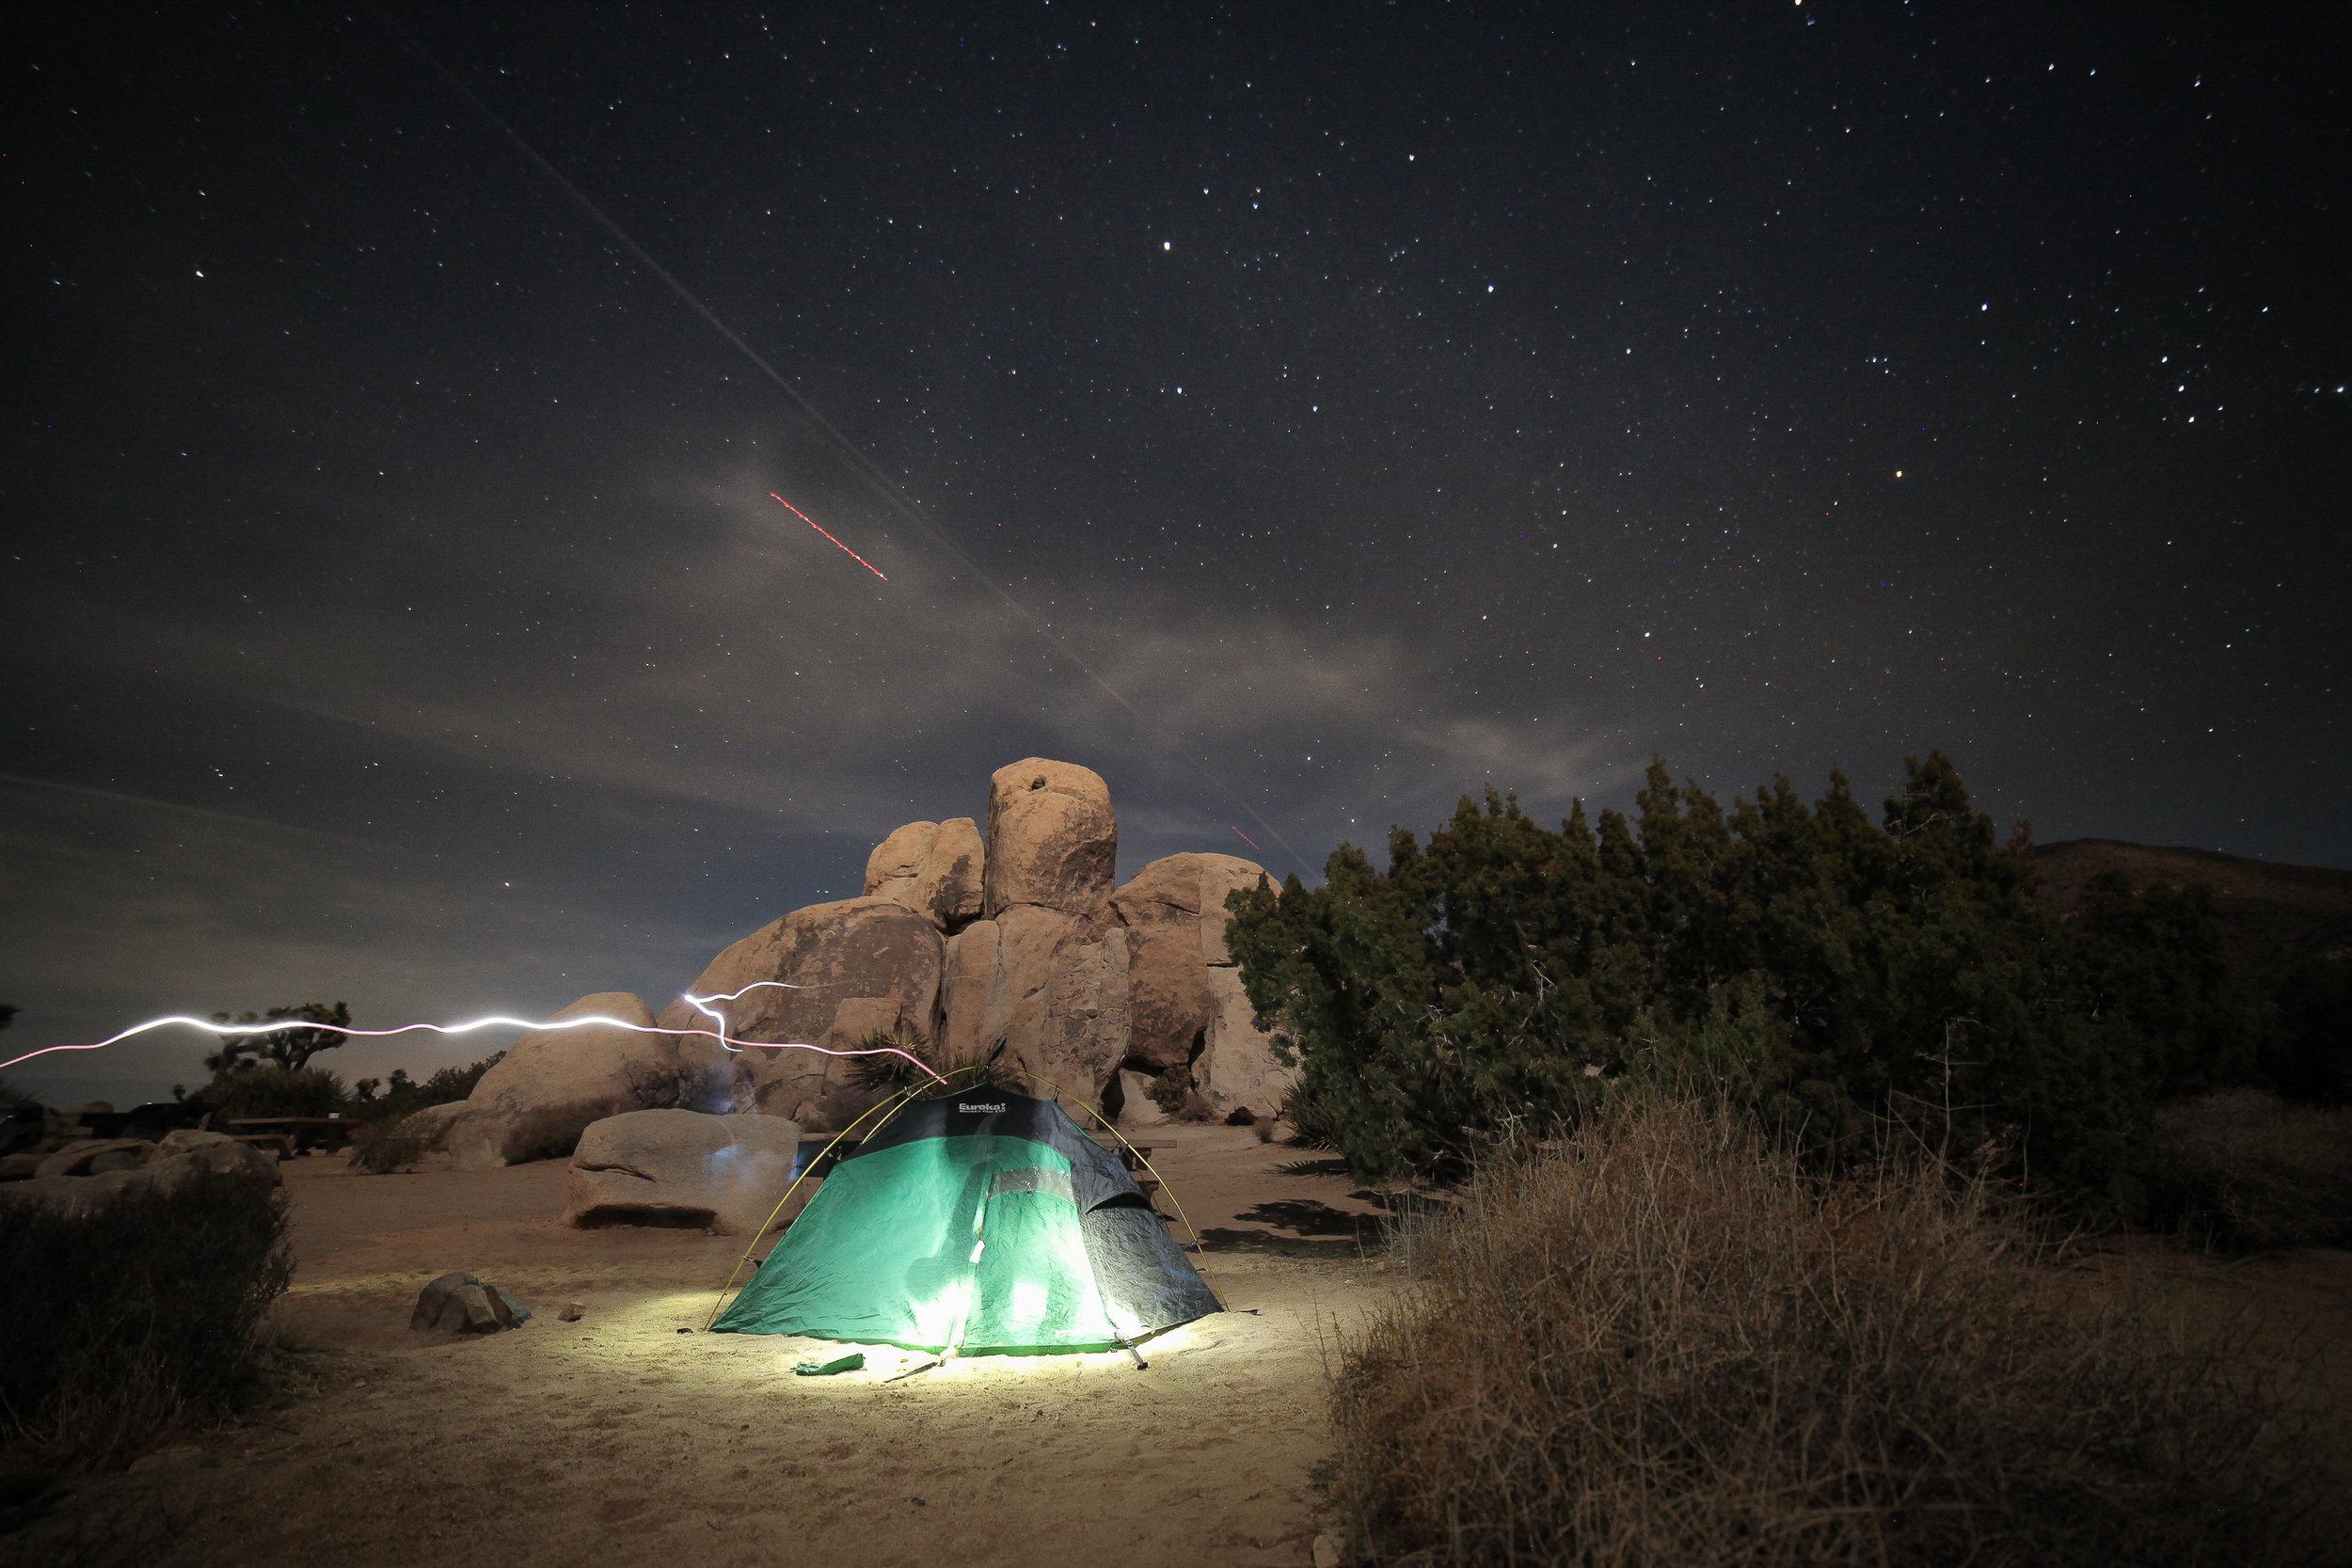 016Travel_Adventure_Photography_Outlive_Creative_California_Joshua_Tree.jpg